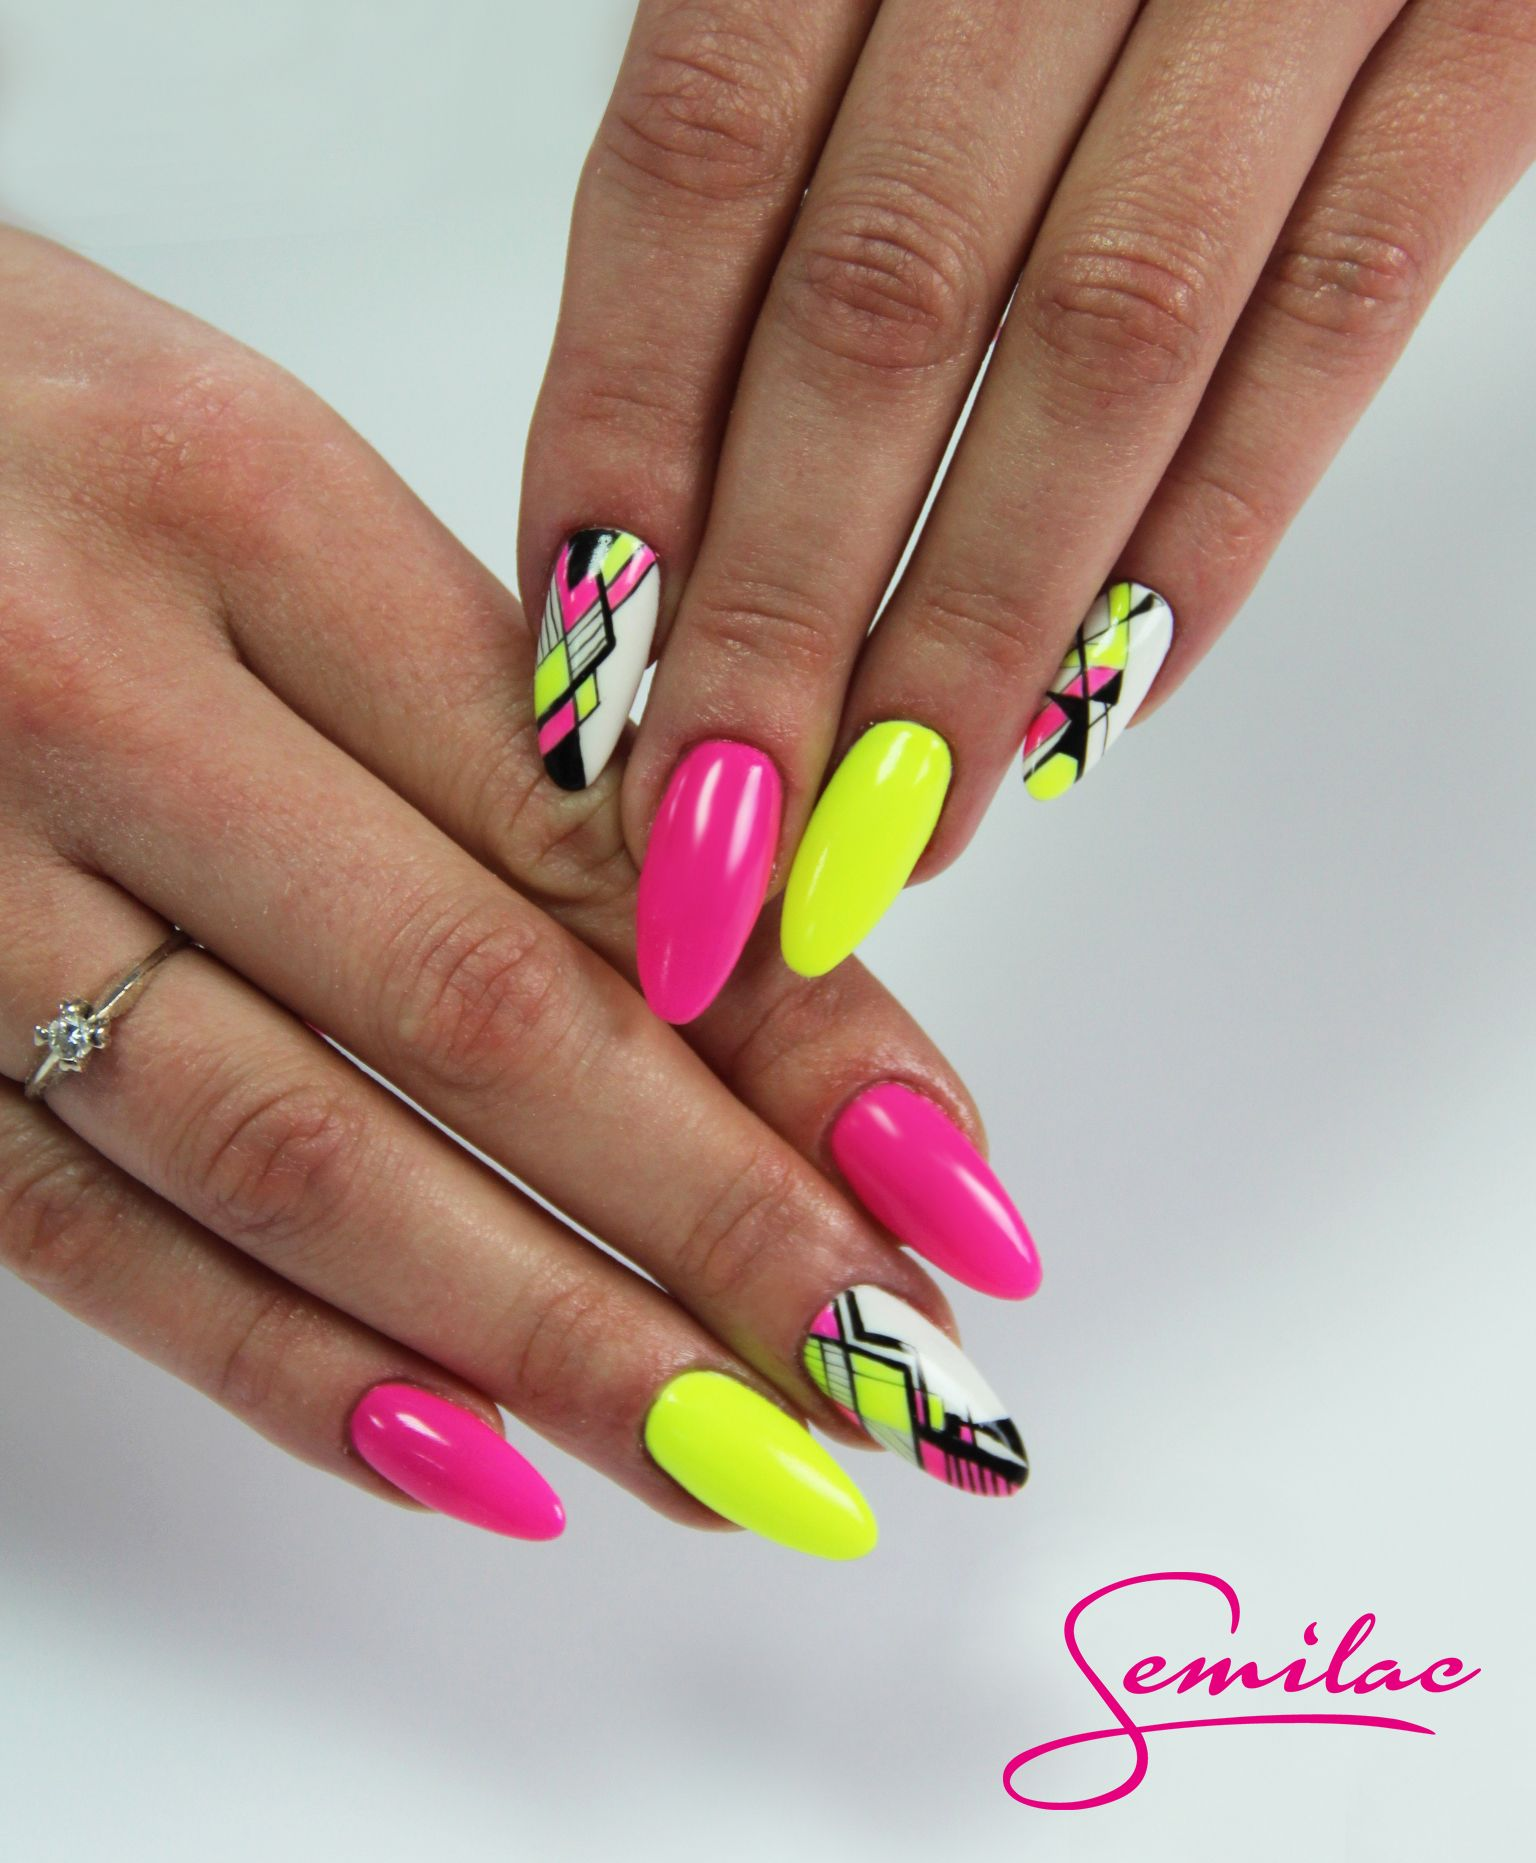 Nails Geometricnails Neon Flo Semilac Pinkdoll Rozowe